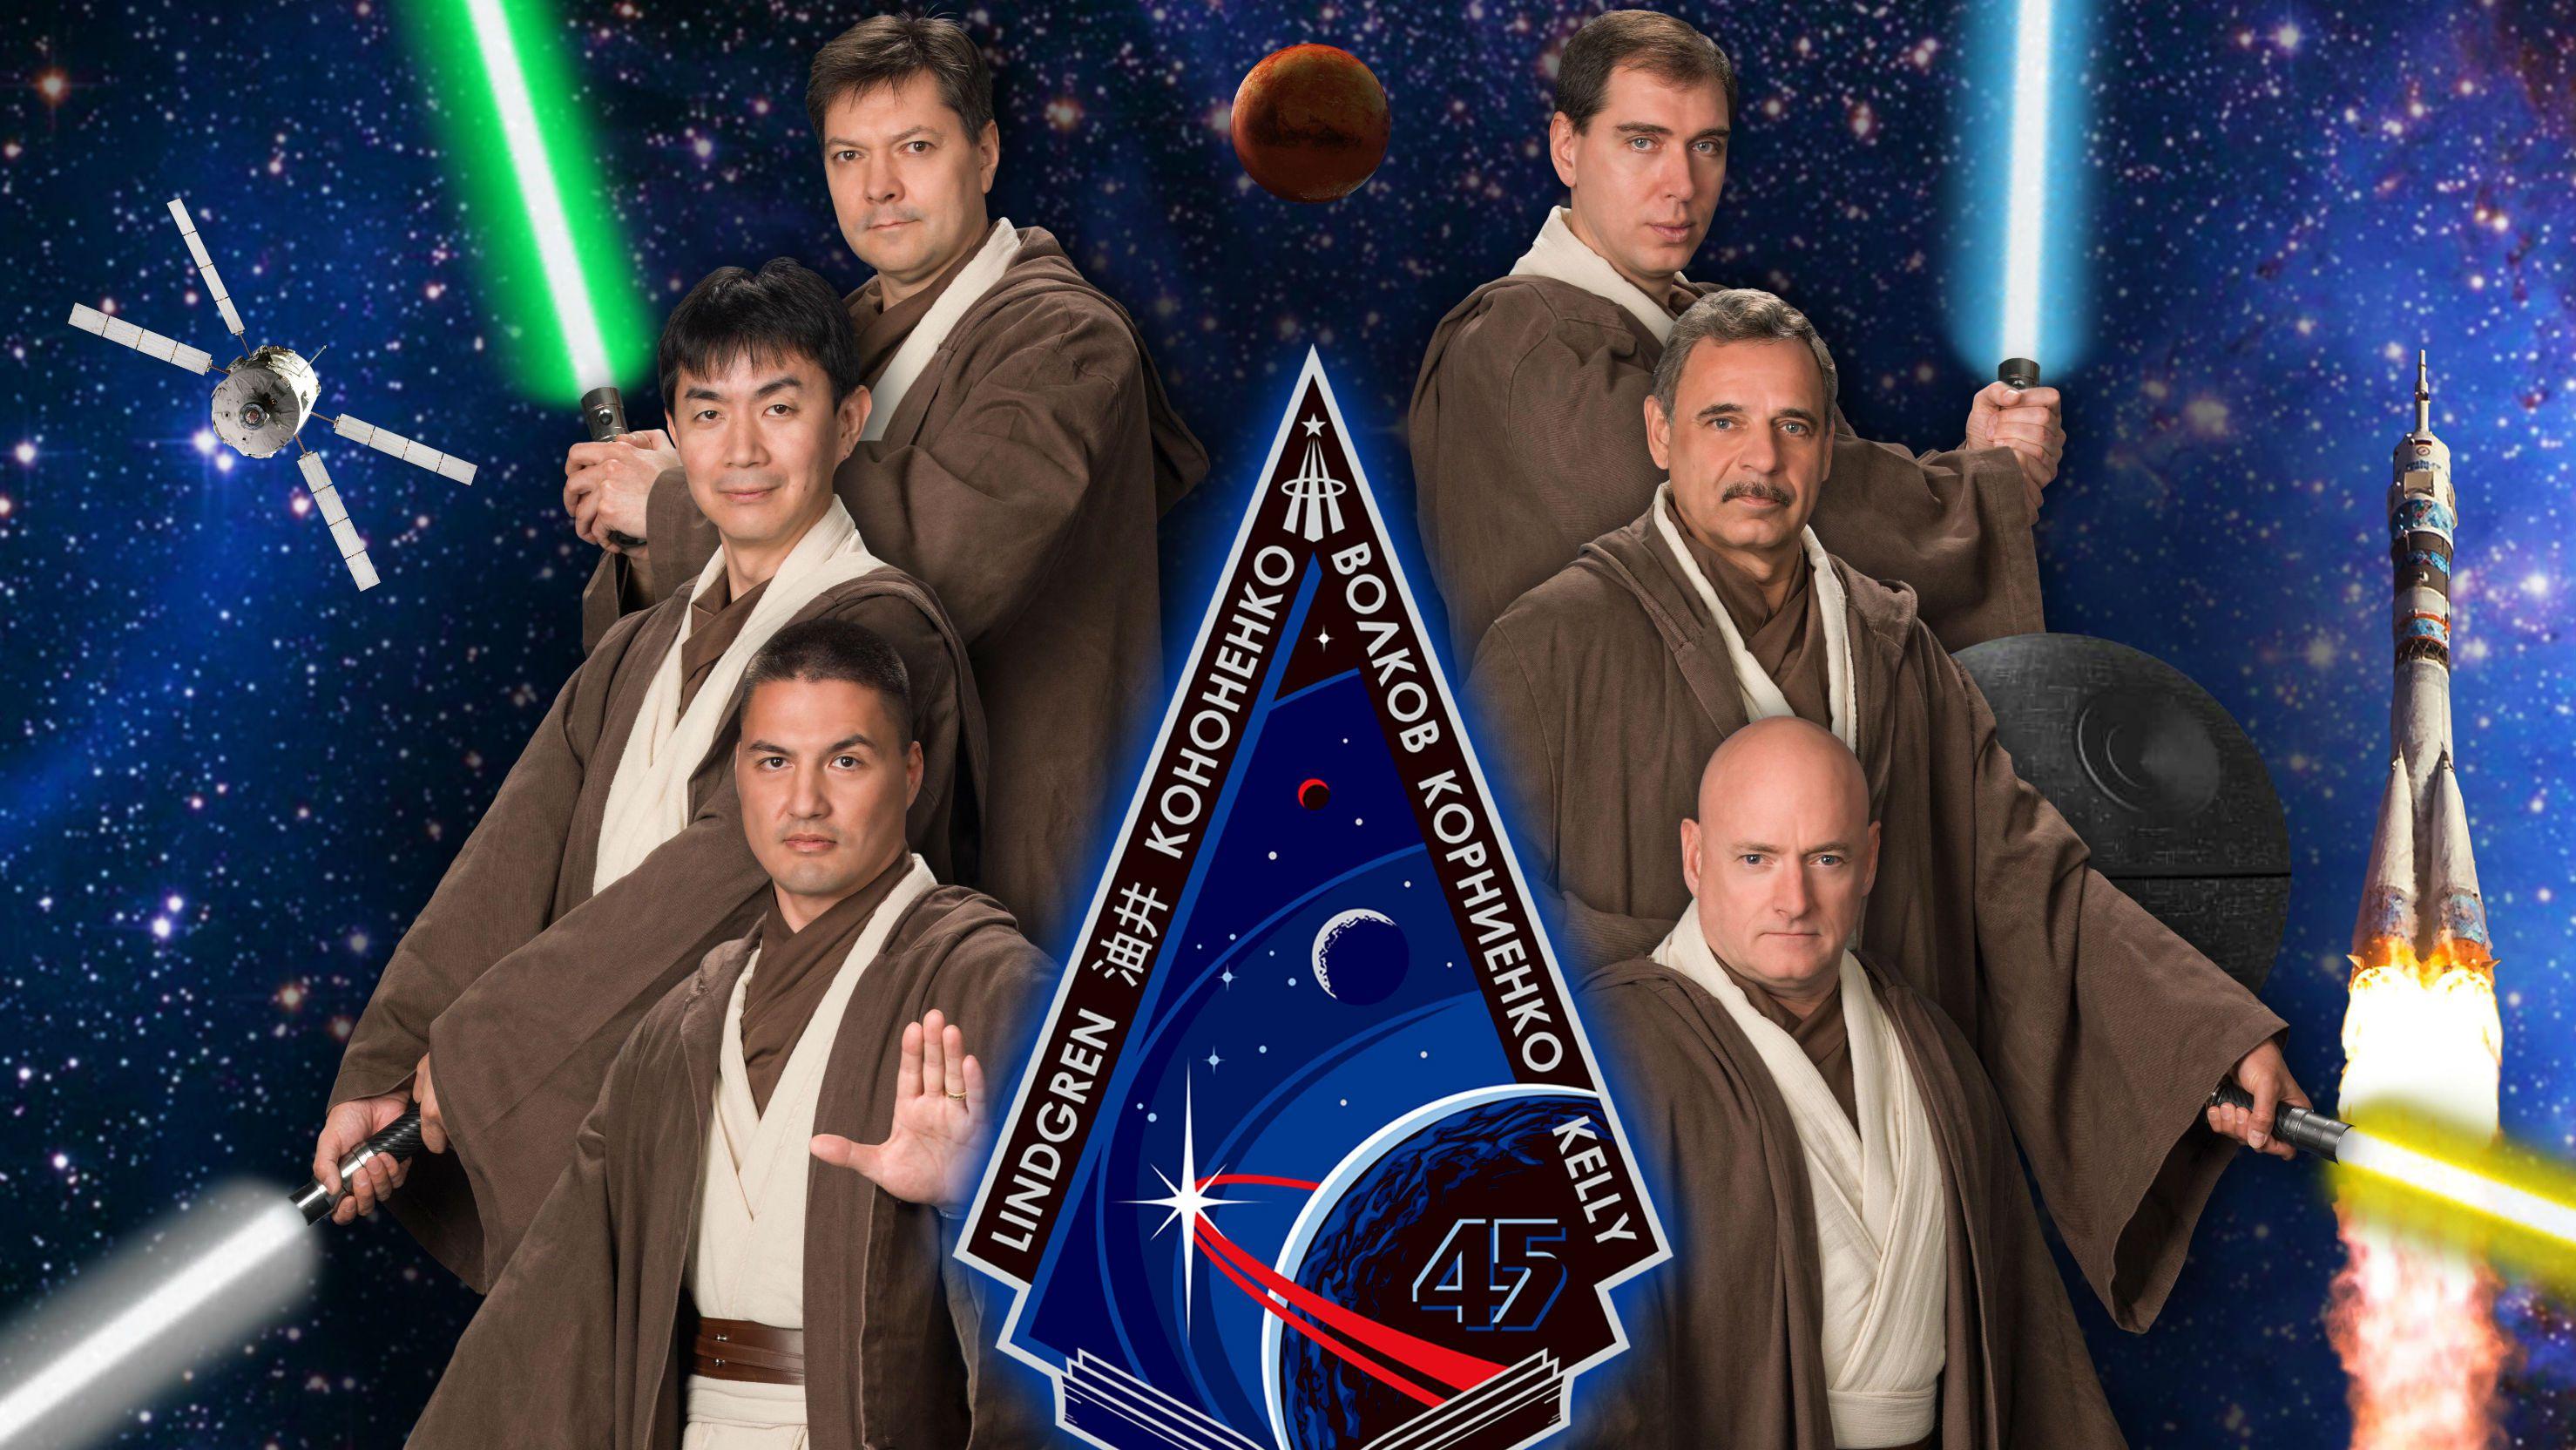 Expedition 45 Jedi